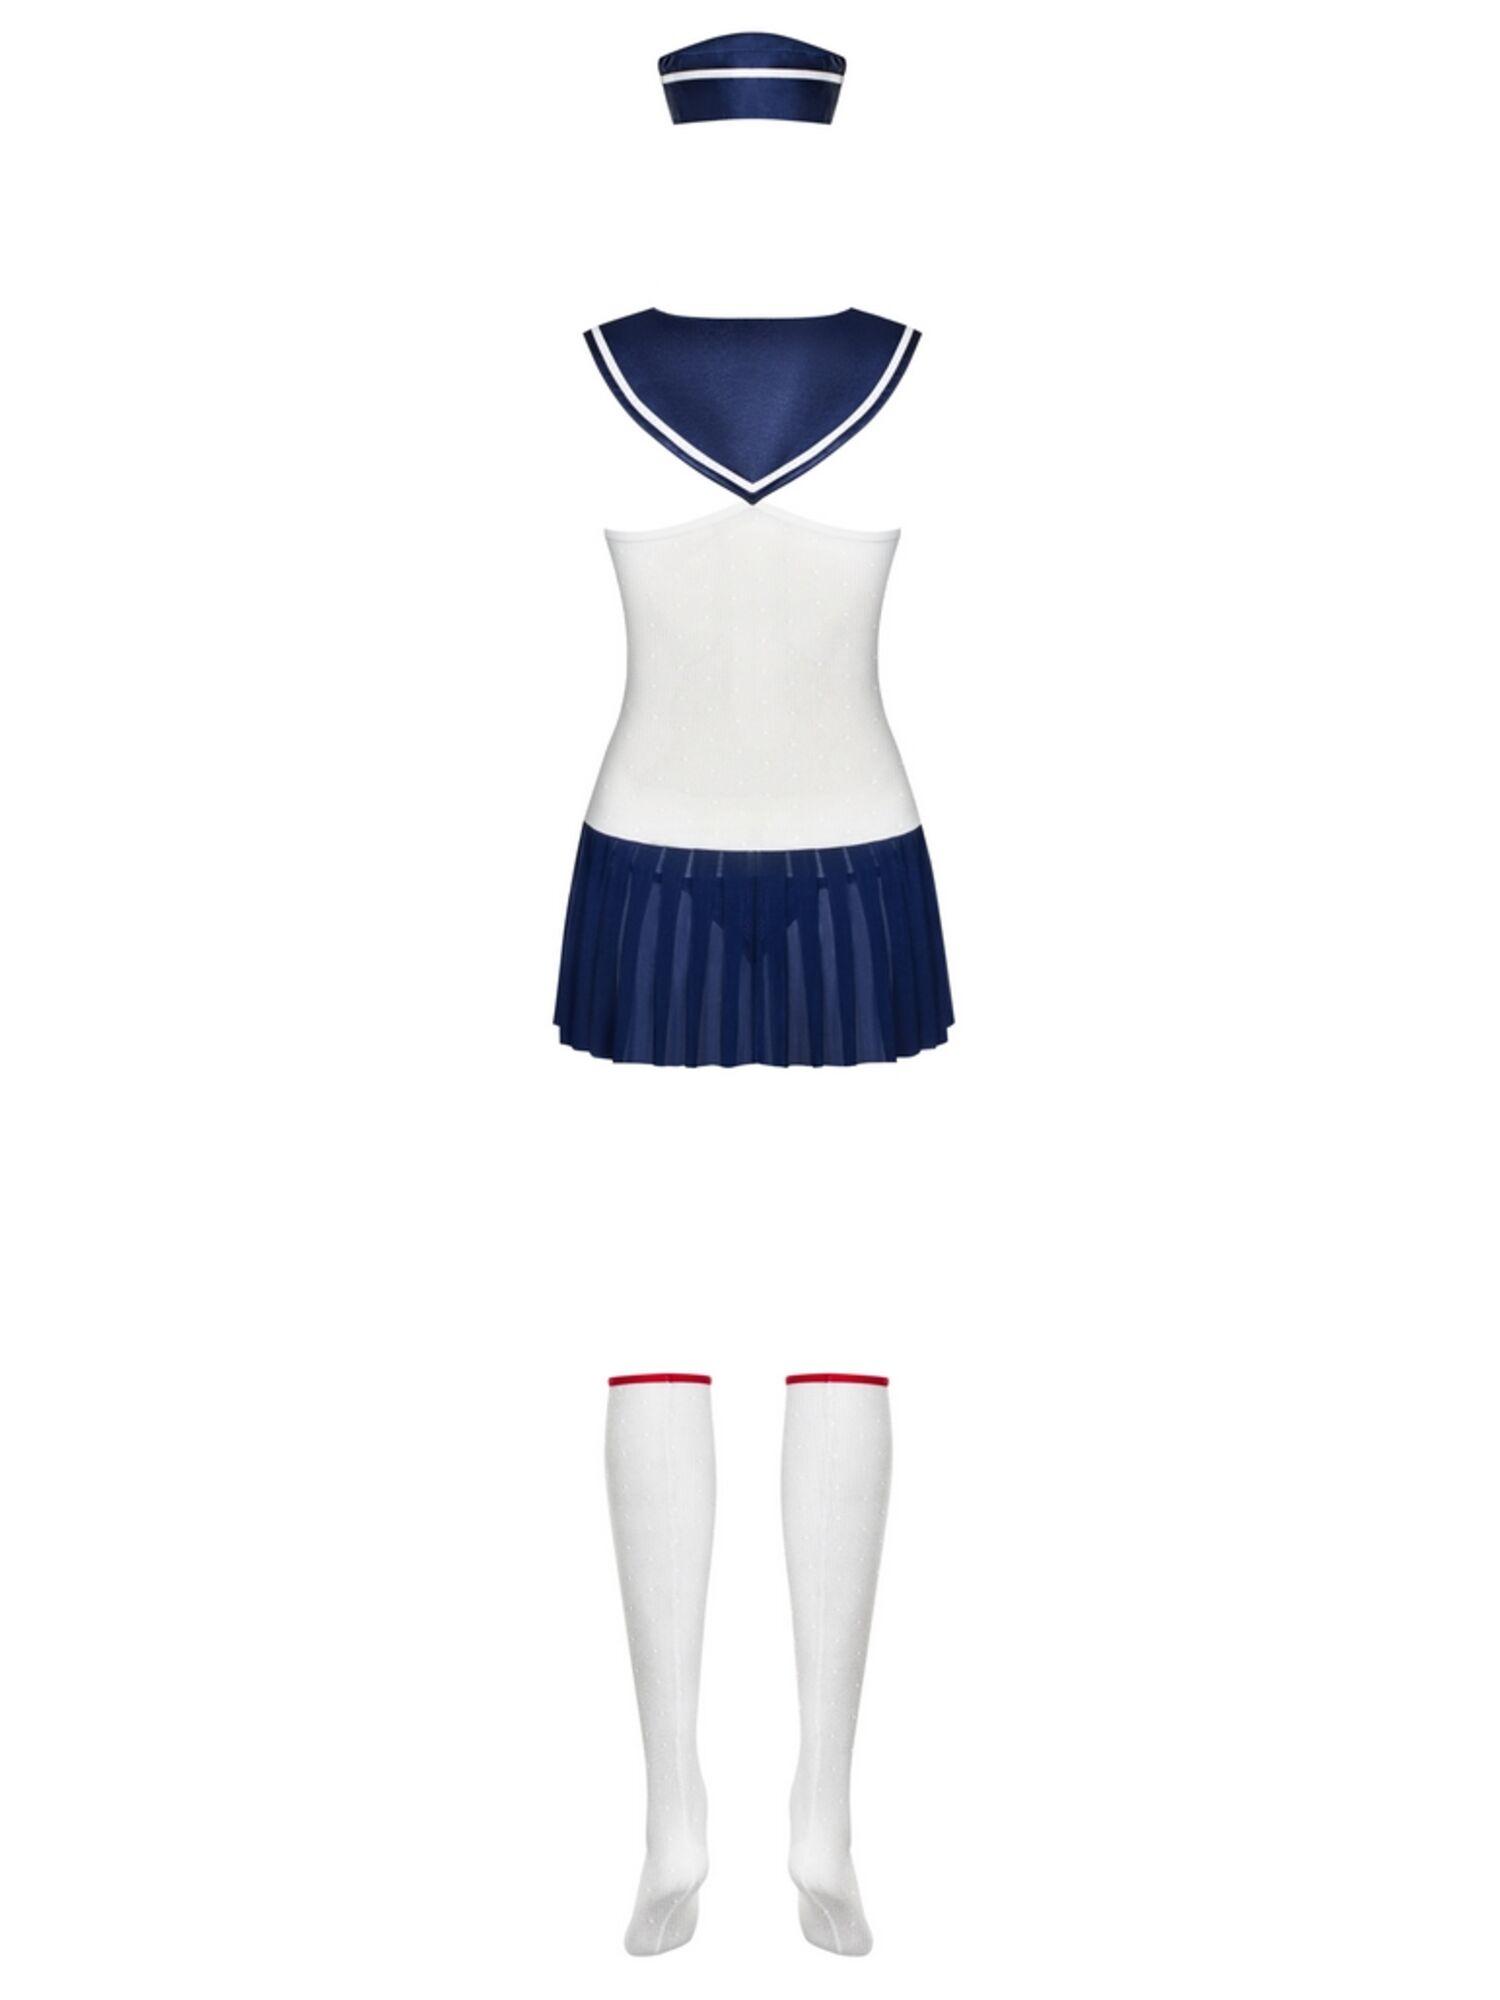 Костюм 813 MARINE COSTUME белый/синий